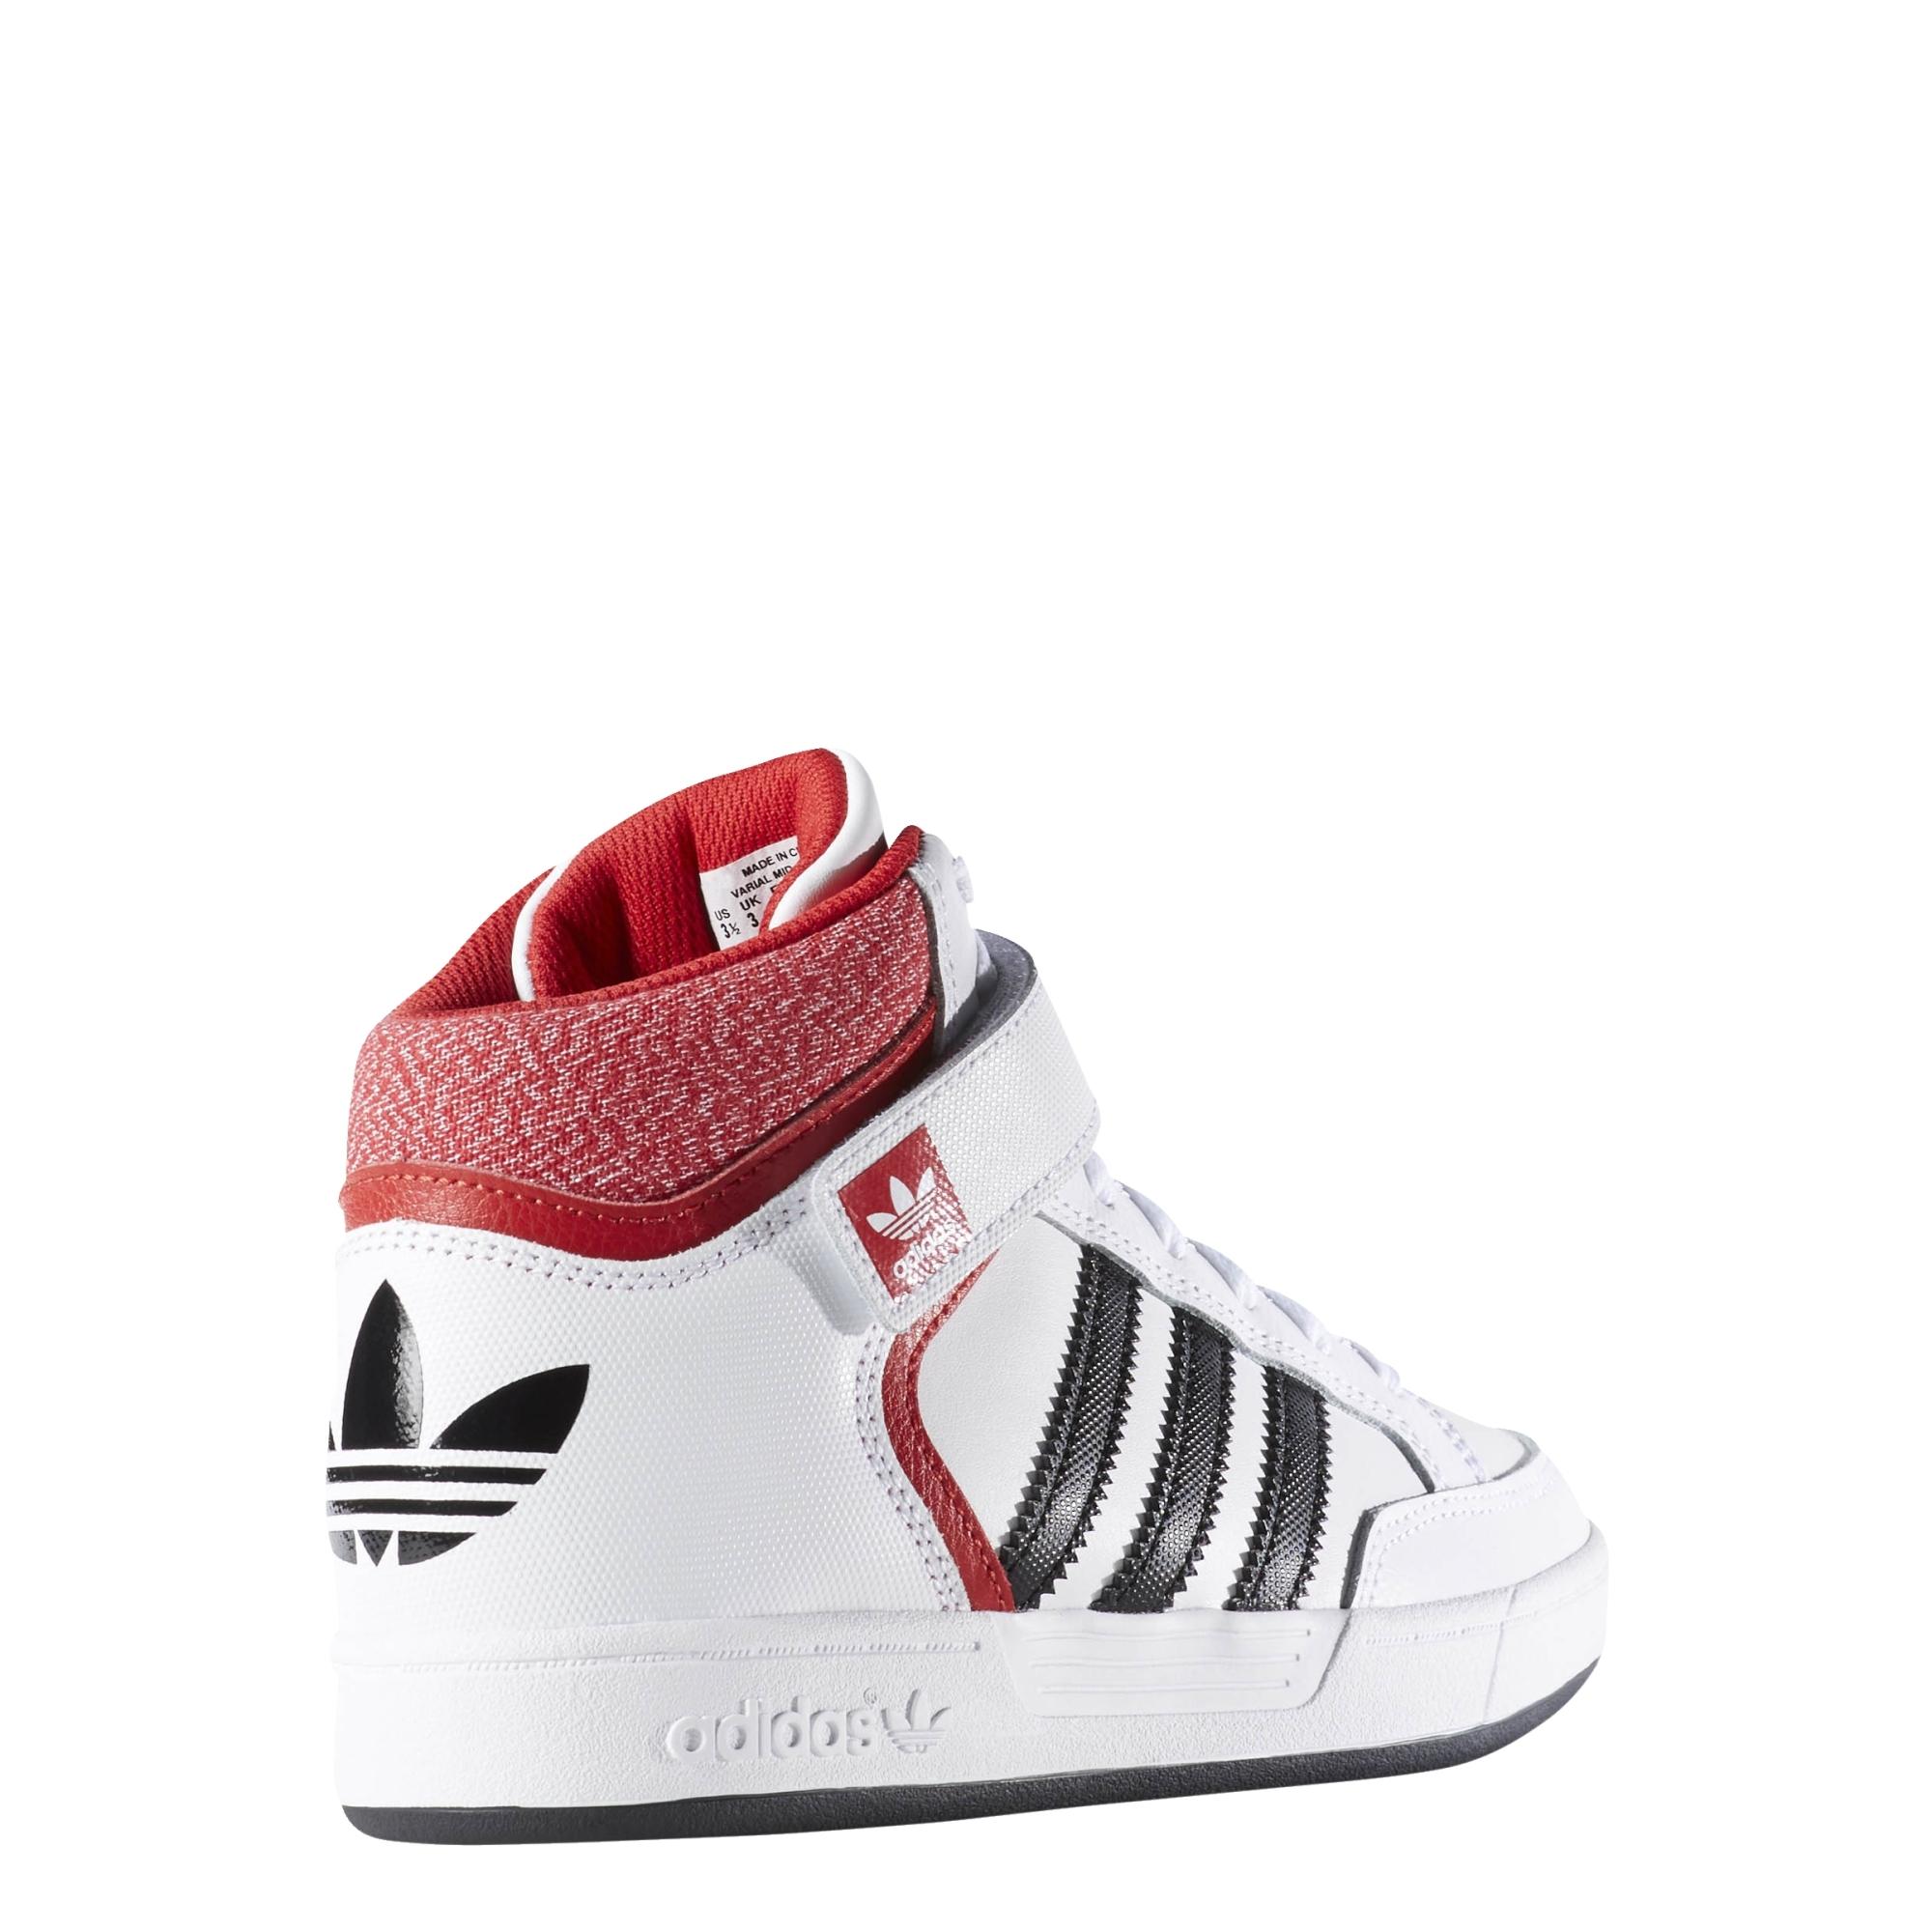 42d0c9610d0c8 buty adidas Varial Mid J B27428 timsport.pl